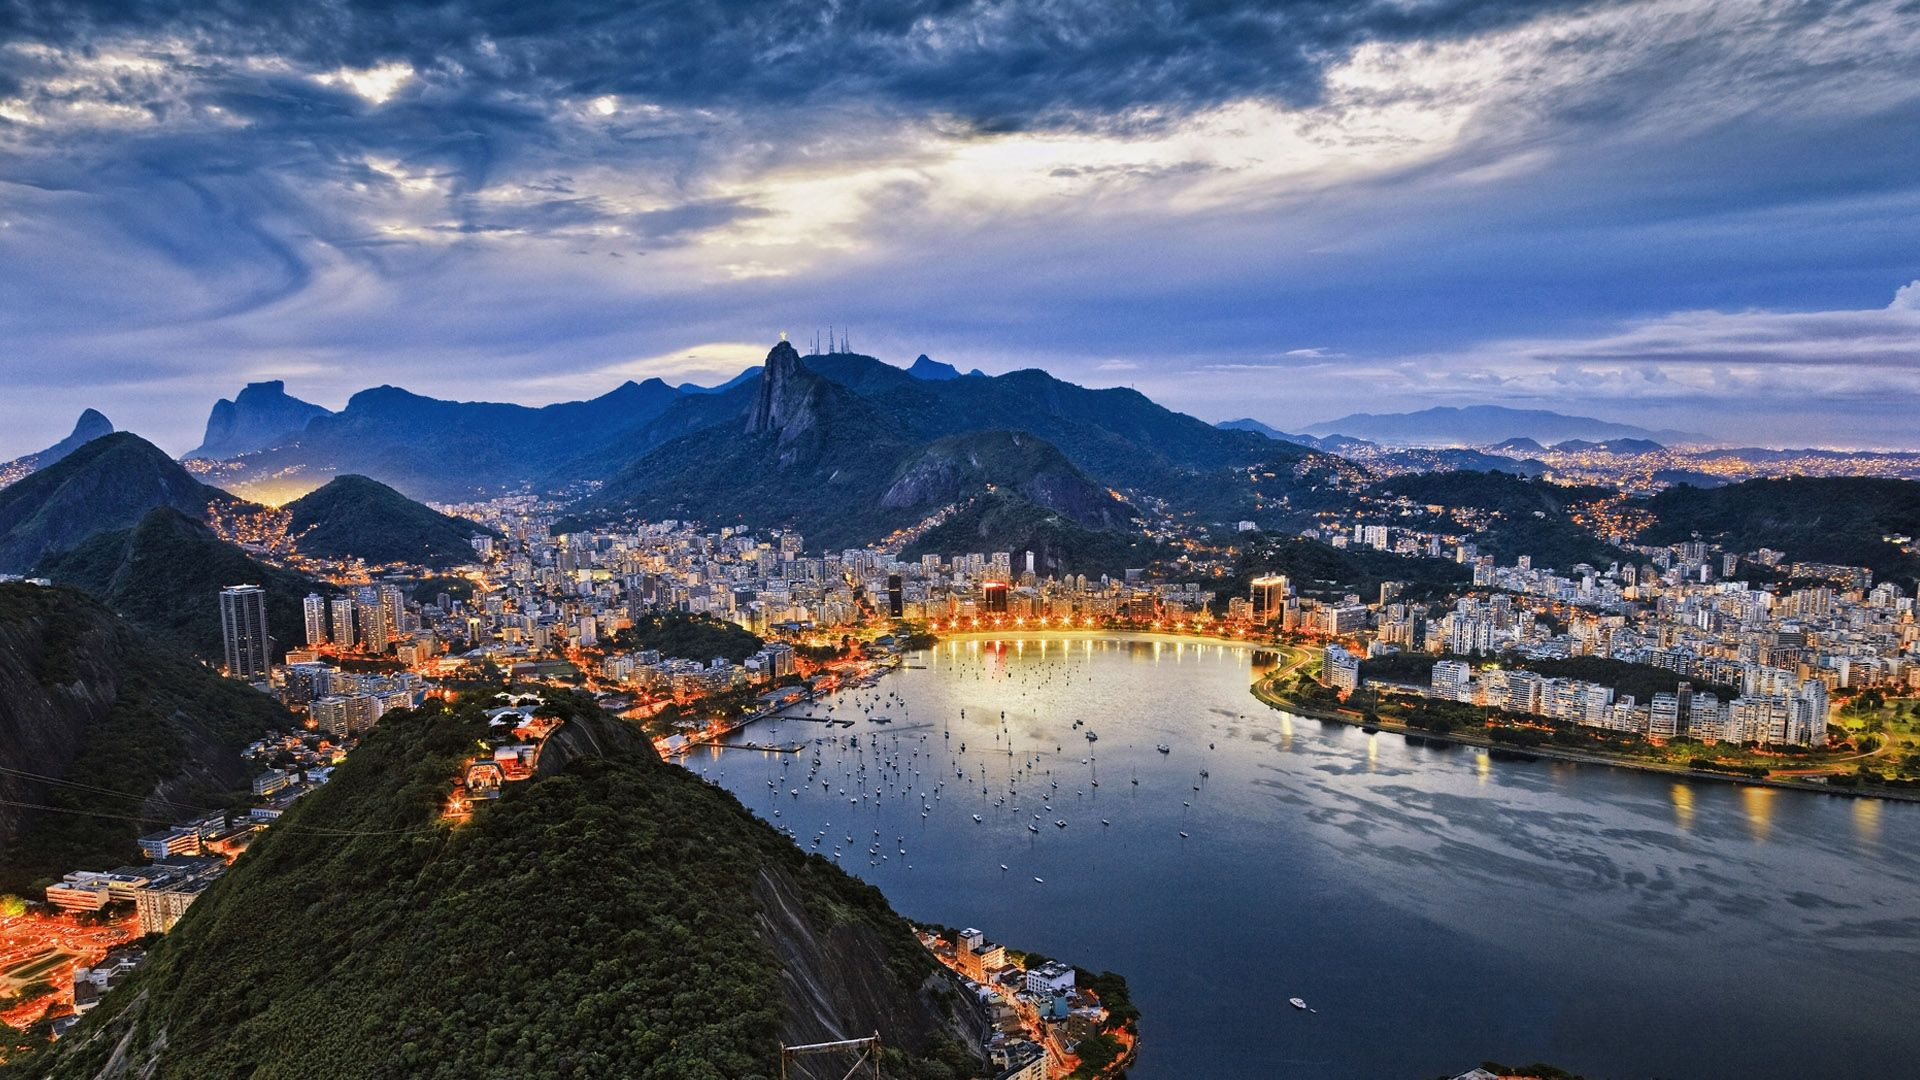 Brazil Desktop Wallpapers Top Free Brazil Desktop Backgrounds